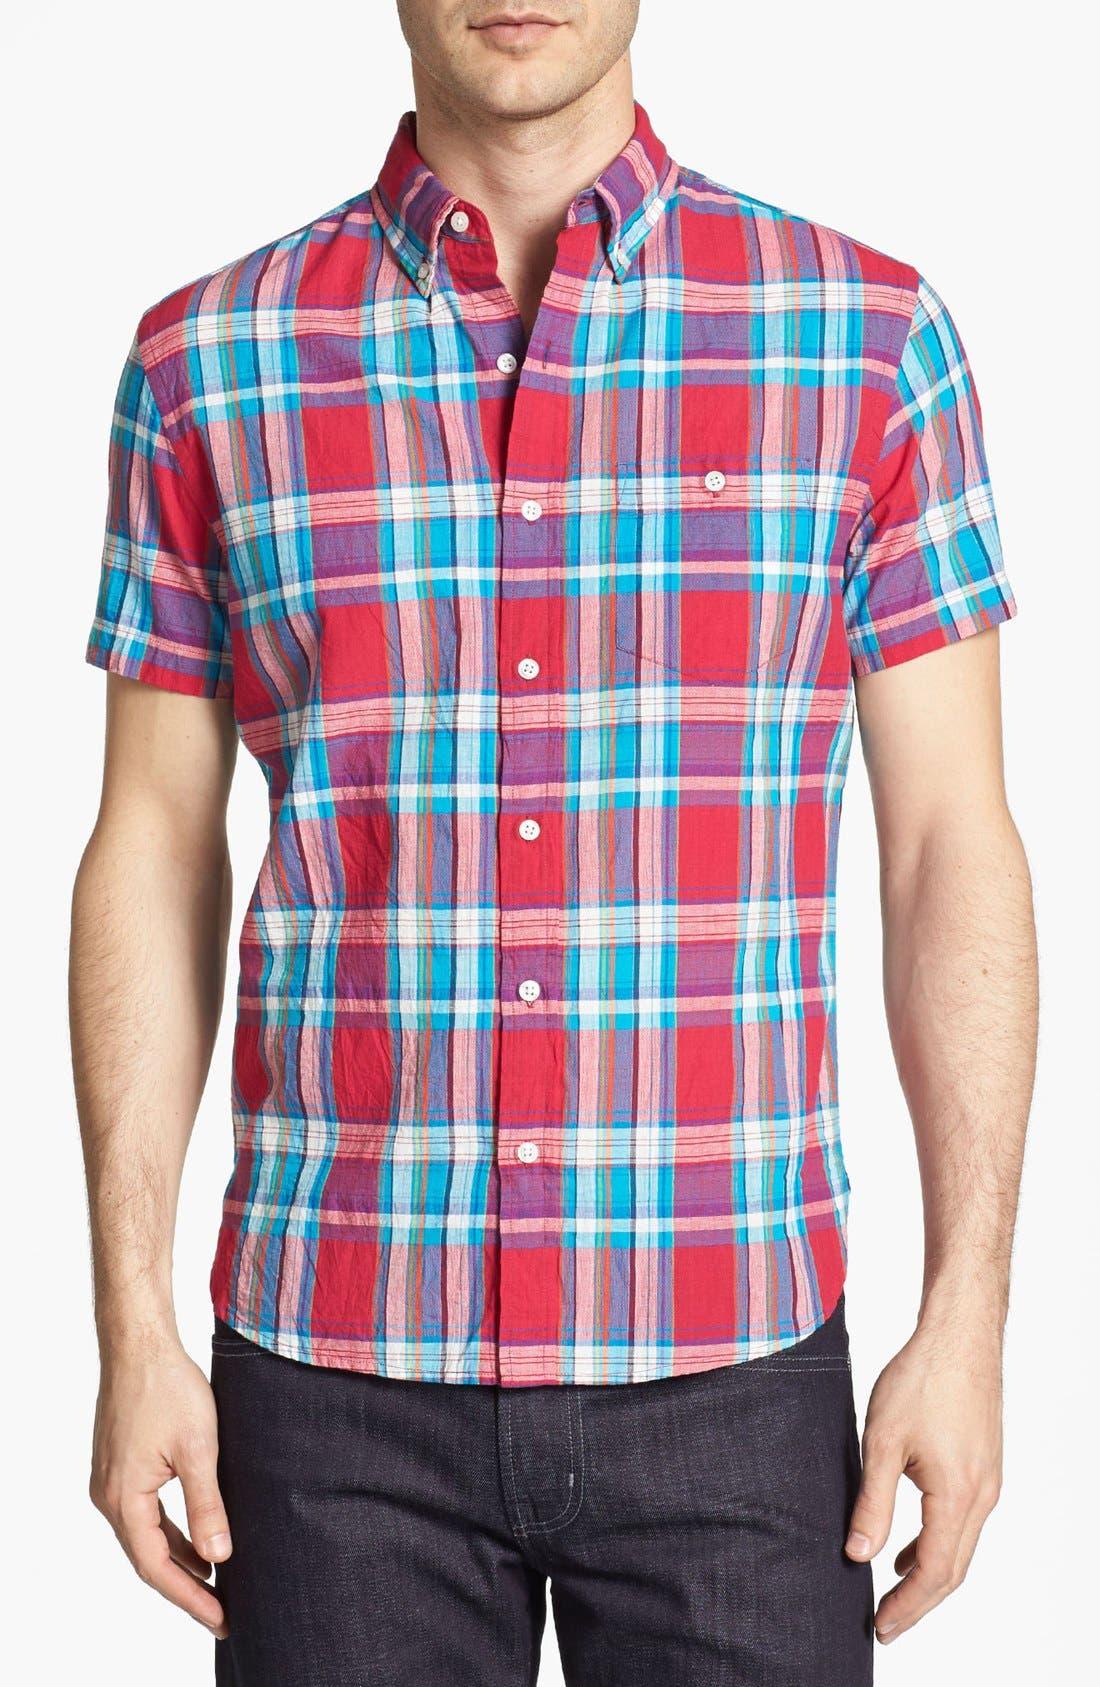 Alternate Image 1 Selected - Bonobos Madras Plaid Standard Fit Short Sleeve Sport Shirt